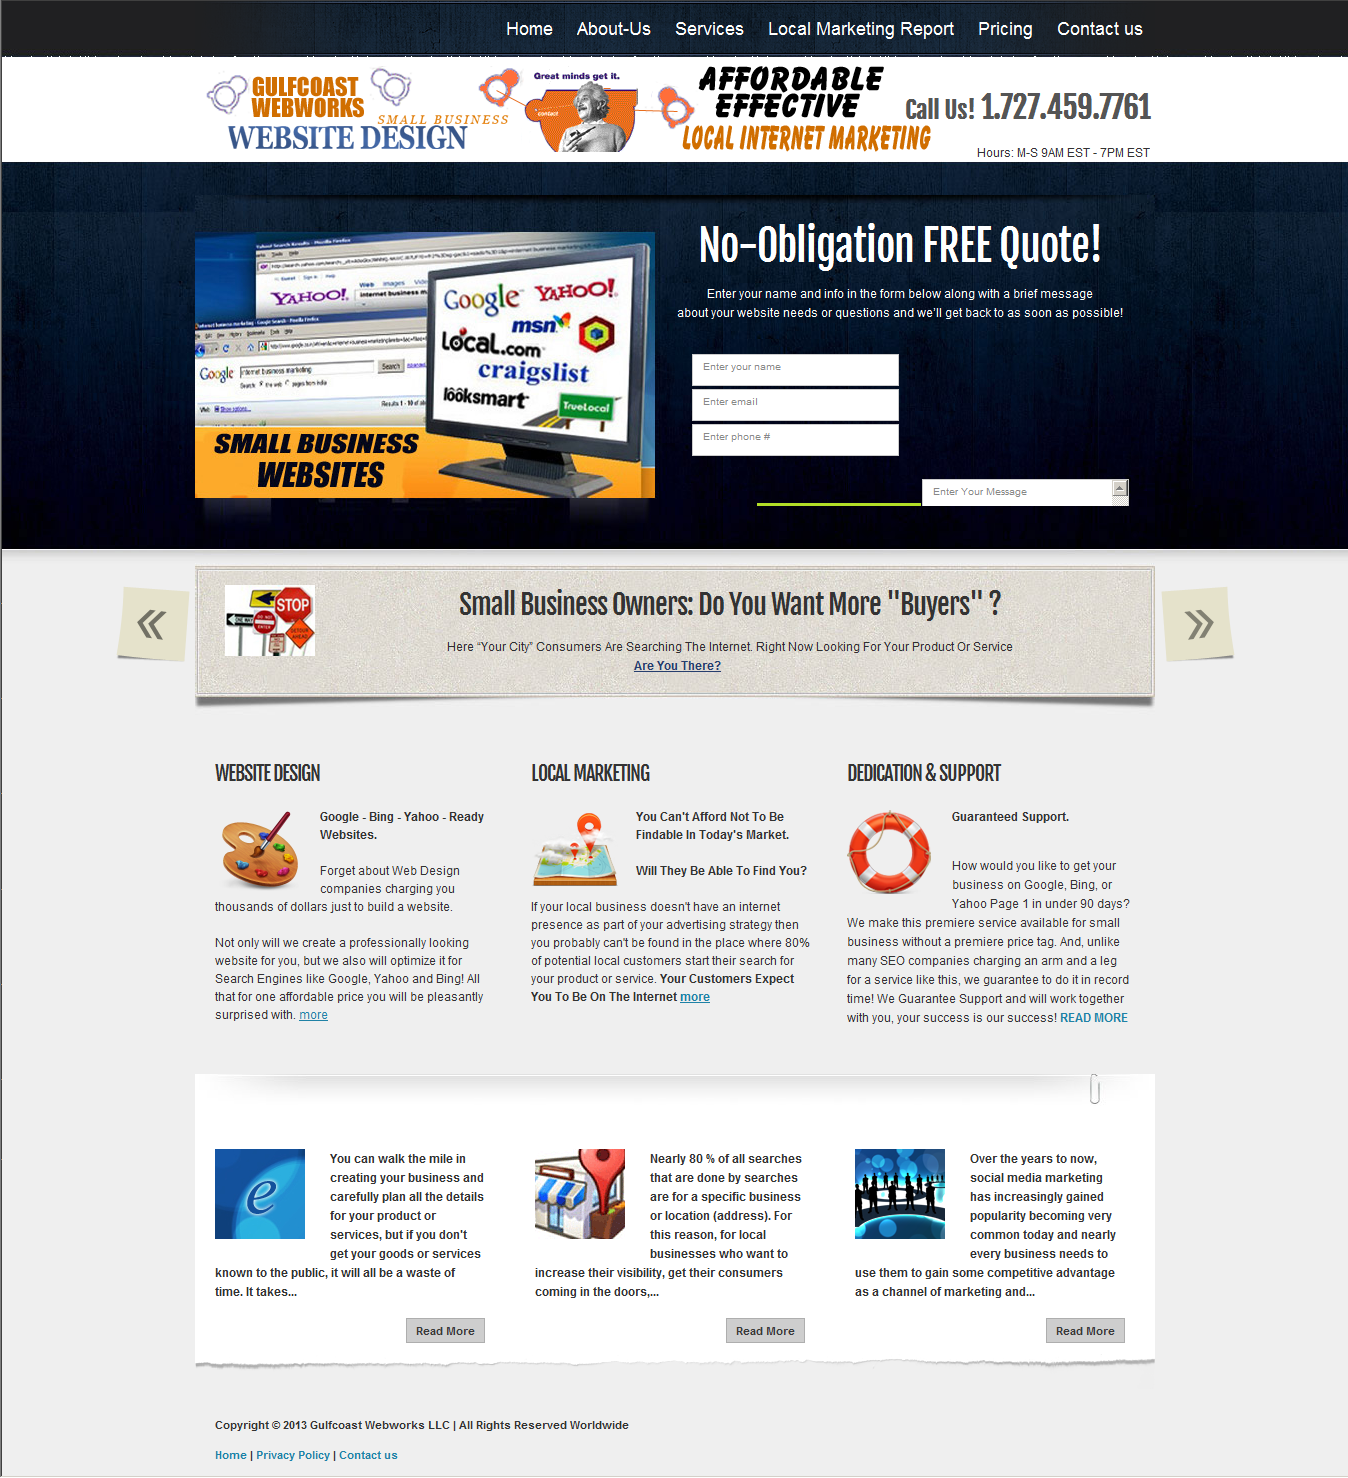 http://www.smallbusinesswebsitestampabay.com